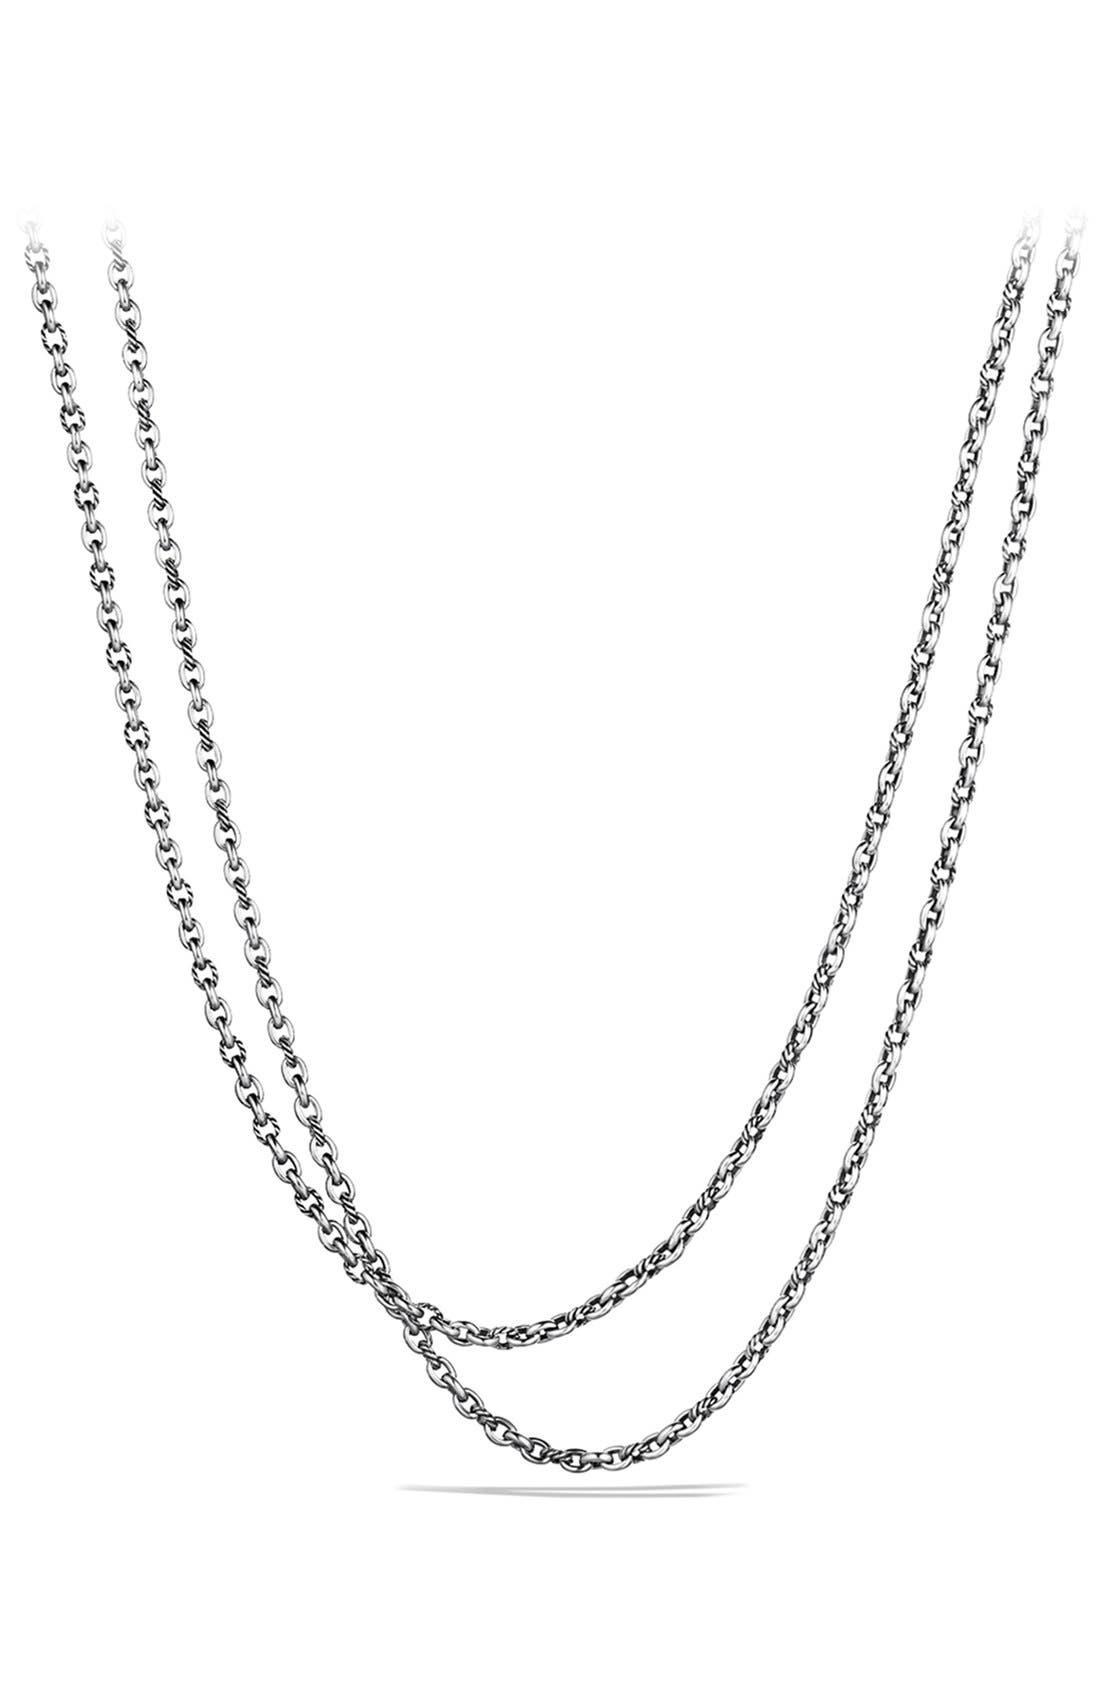 David Yurman 'Oval' Link Necklace